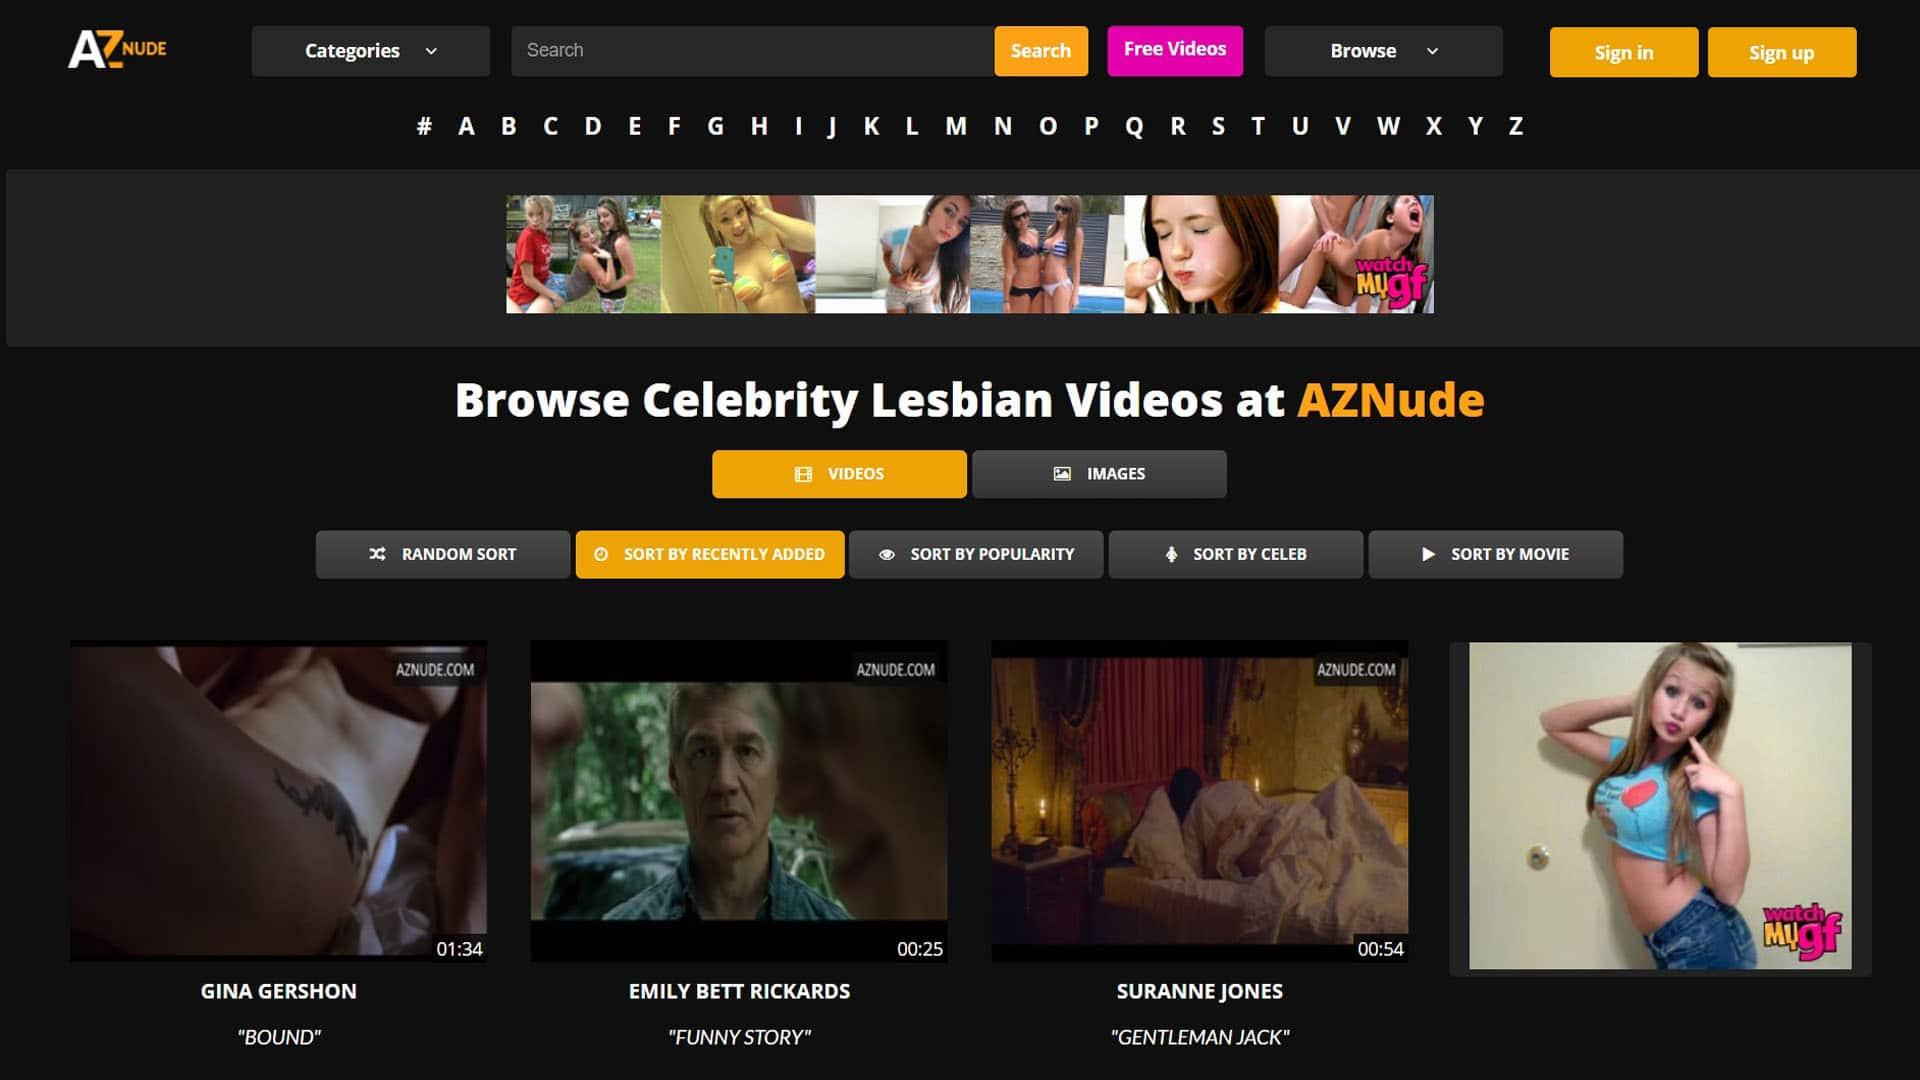 AZNude Celebrity Lesbian Videos